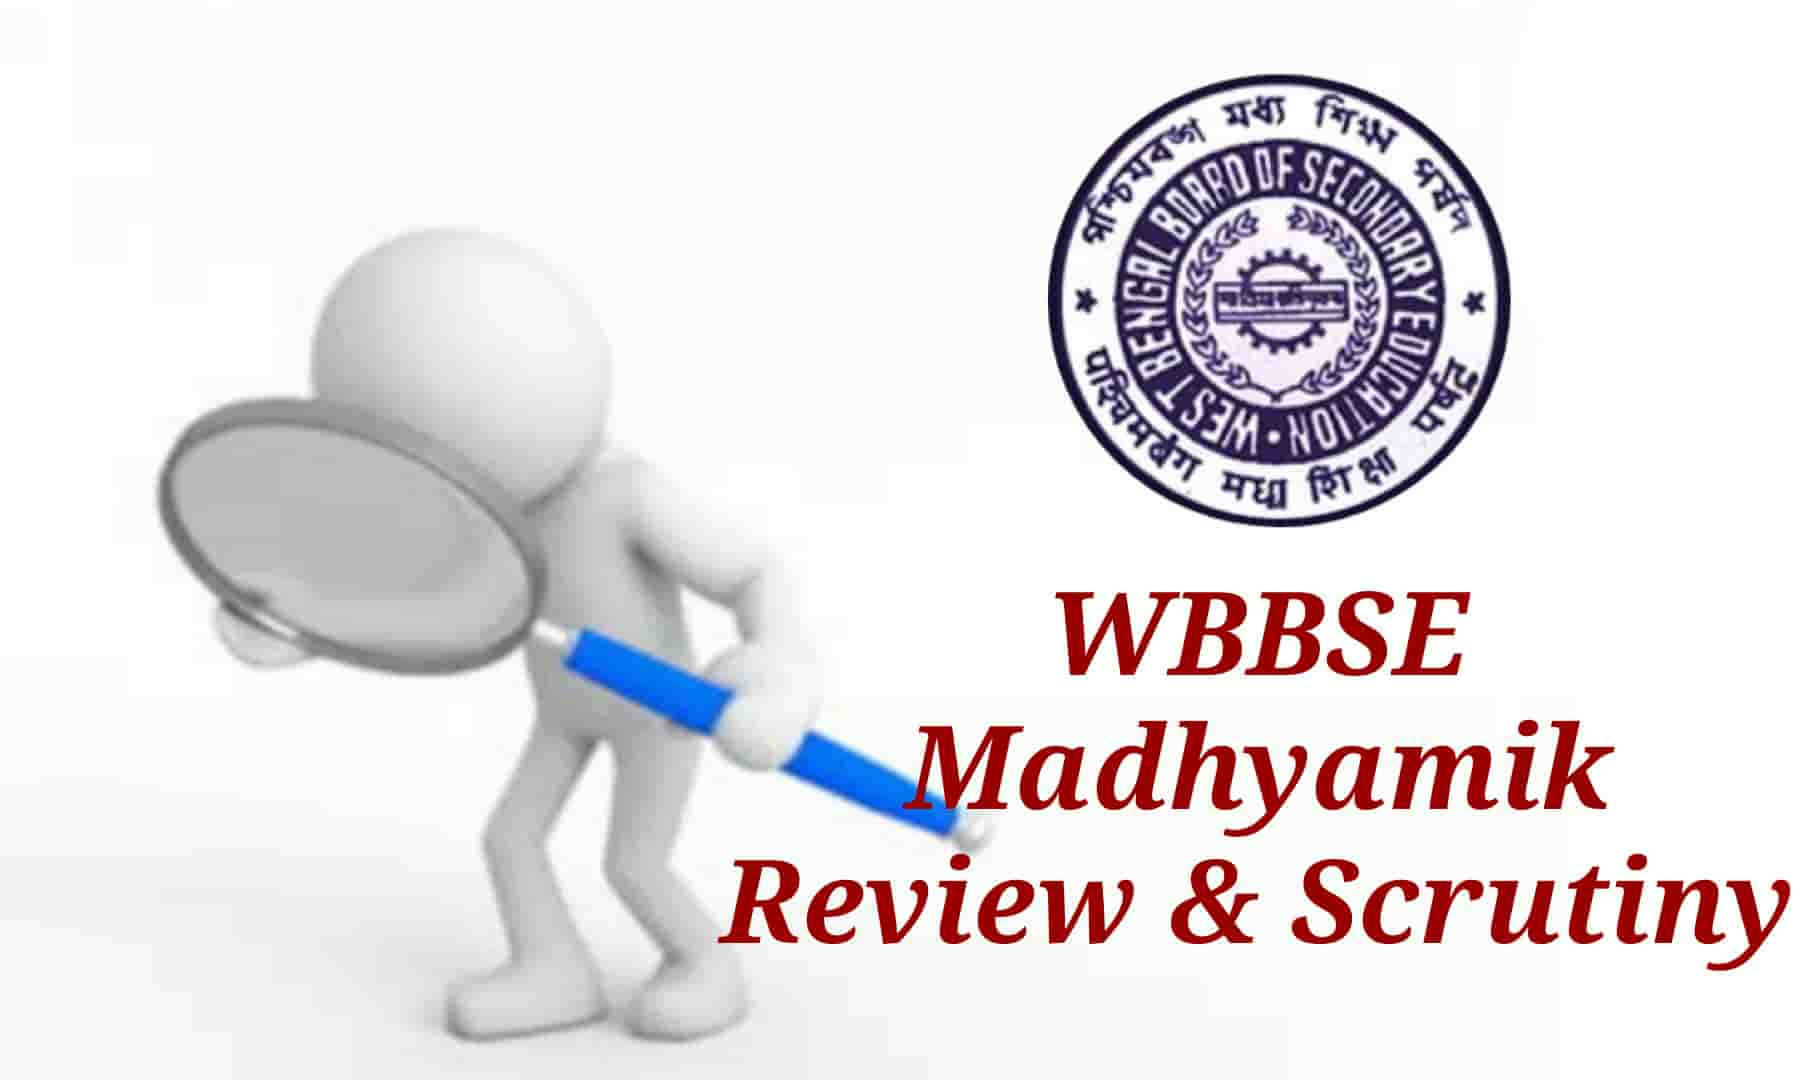 WB Madhyamik Review Scrutiny